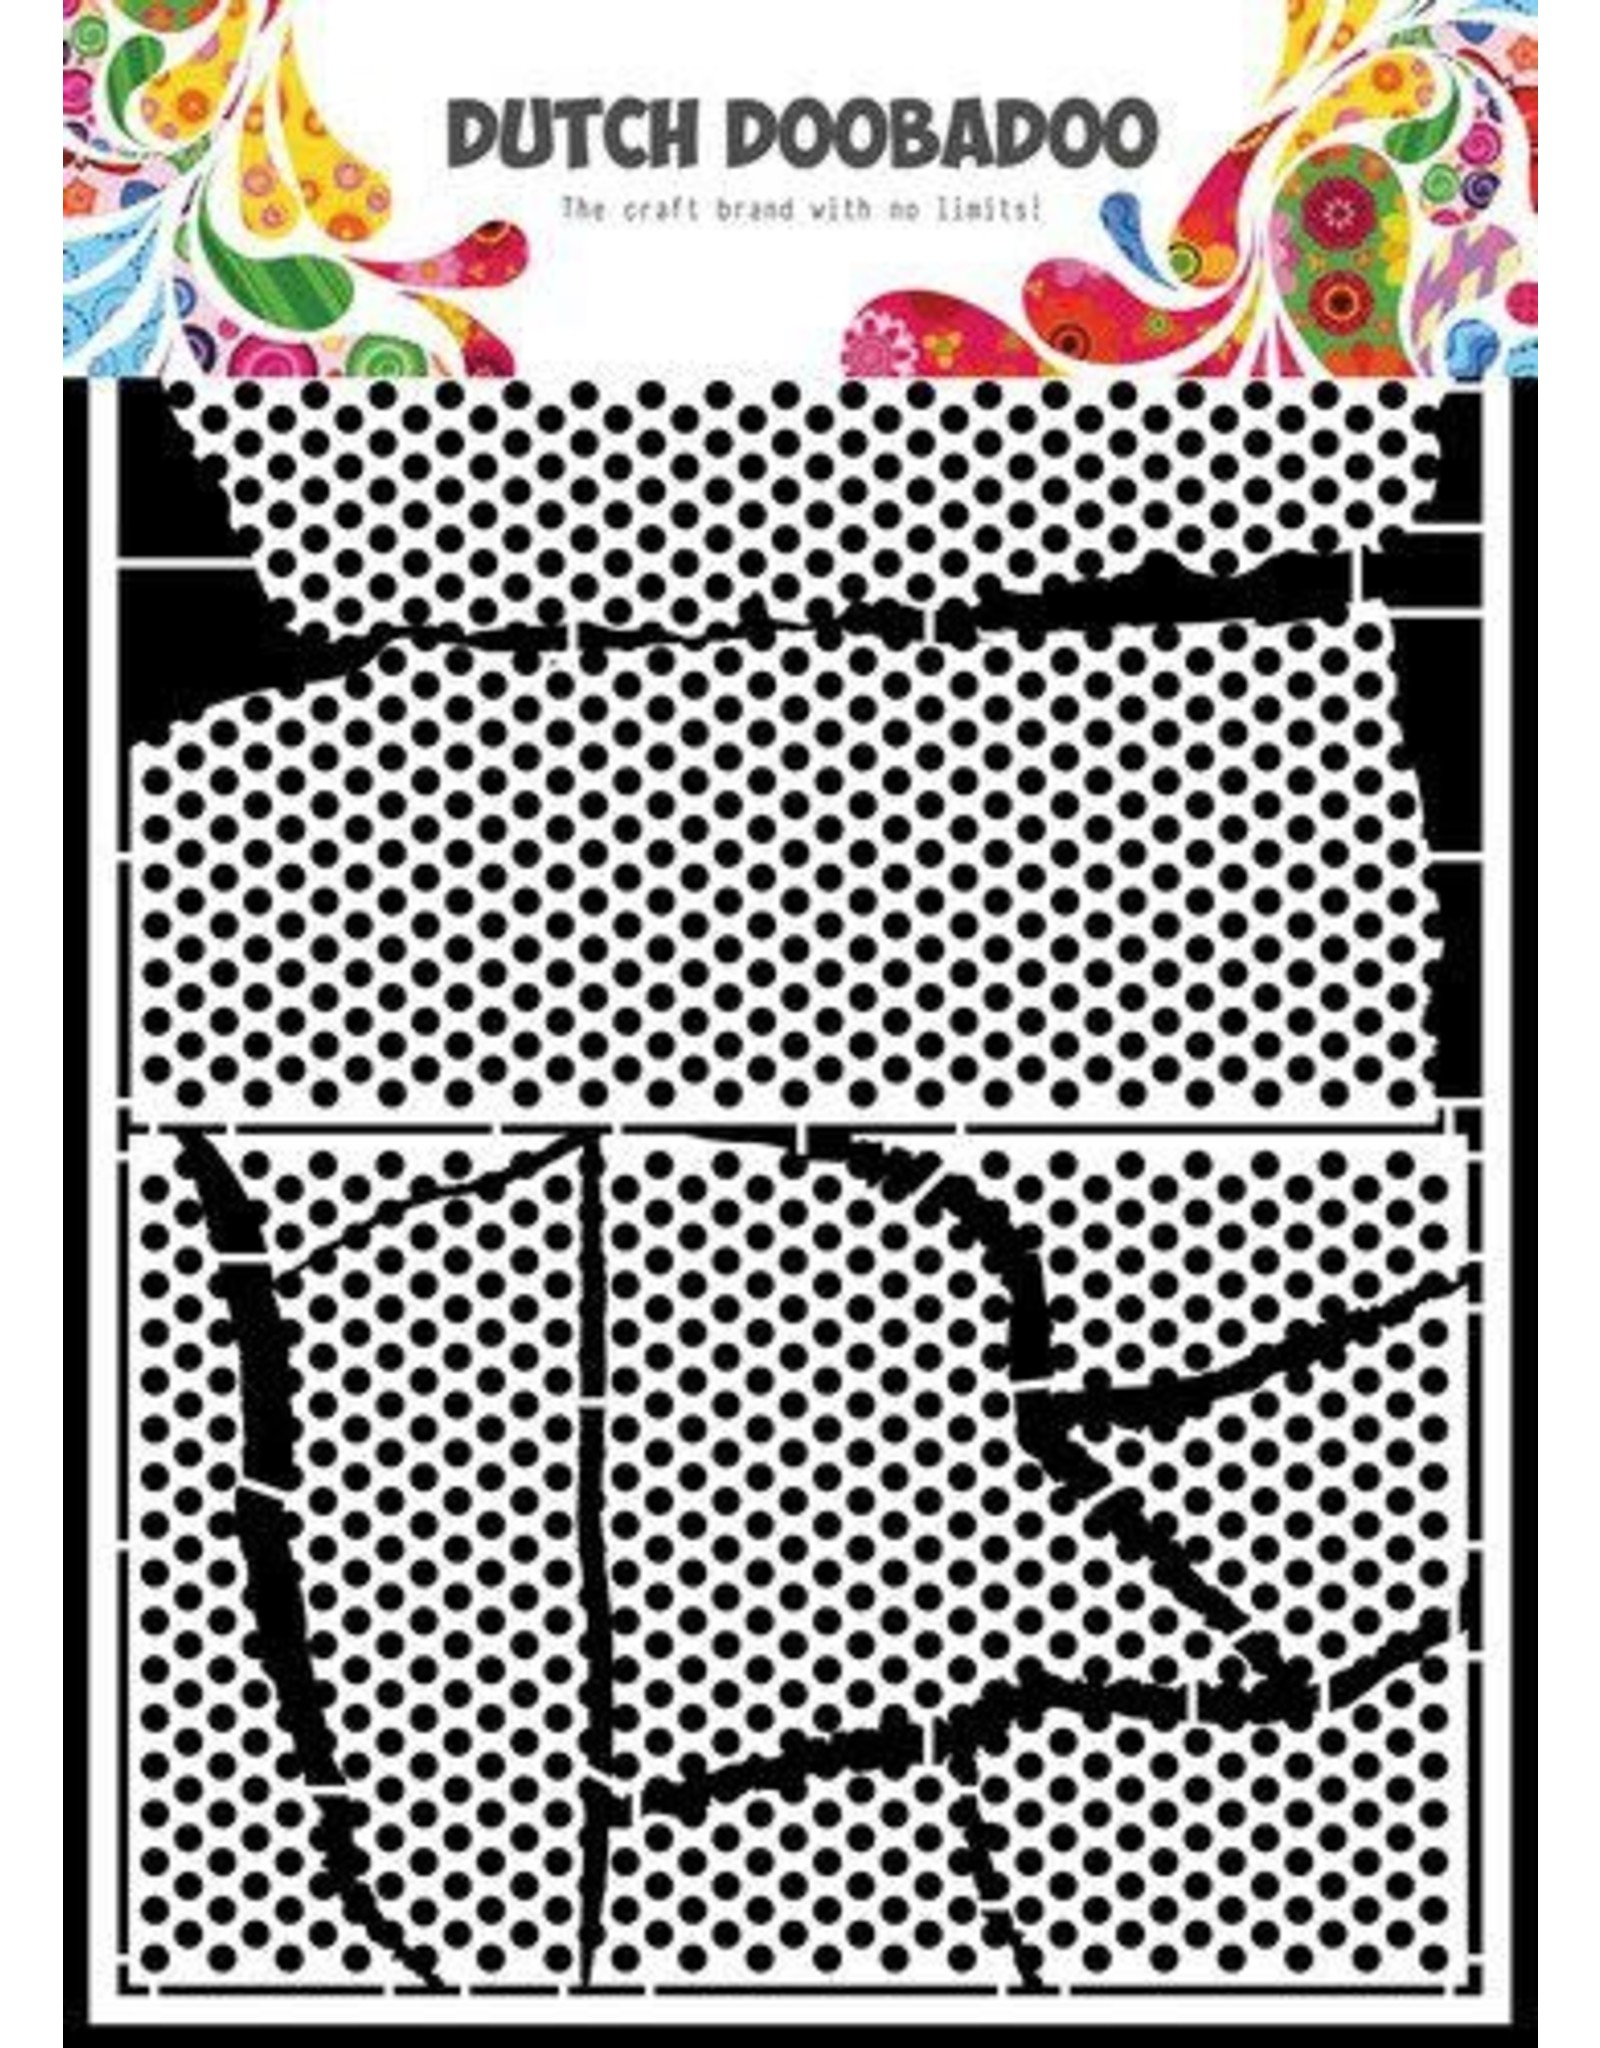 Dutch Doobadoo Dutch Doobadoo Dutch Paper Art Stuc Tape A5 472.948.053